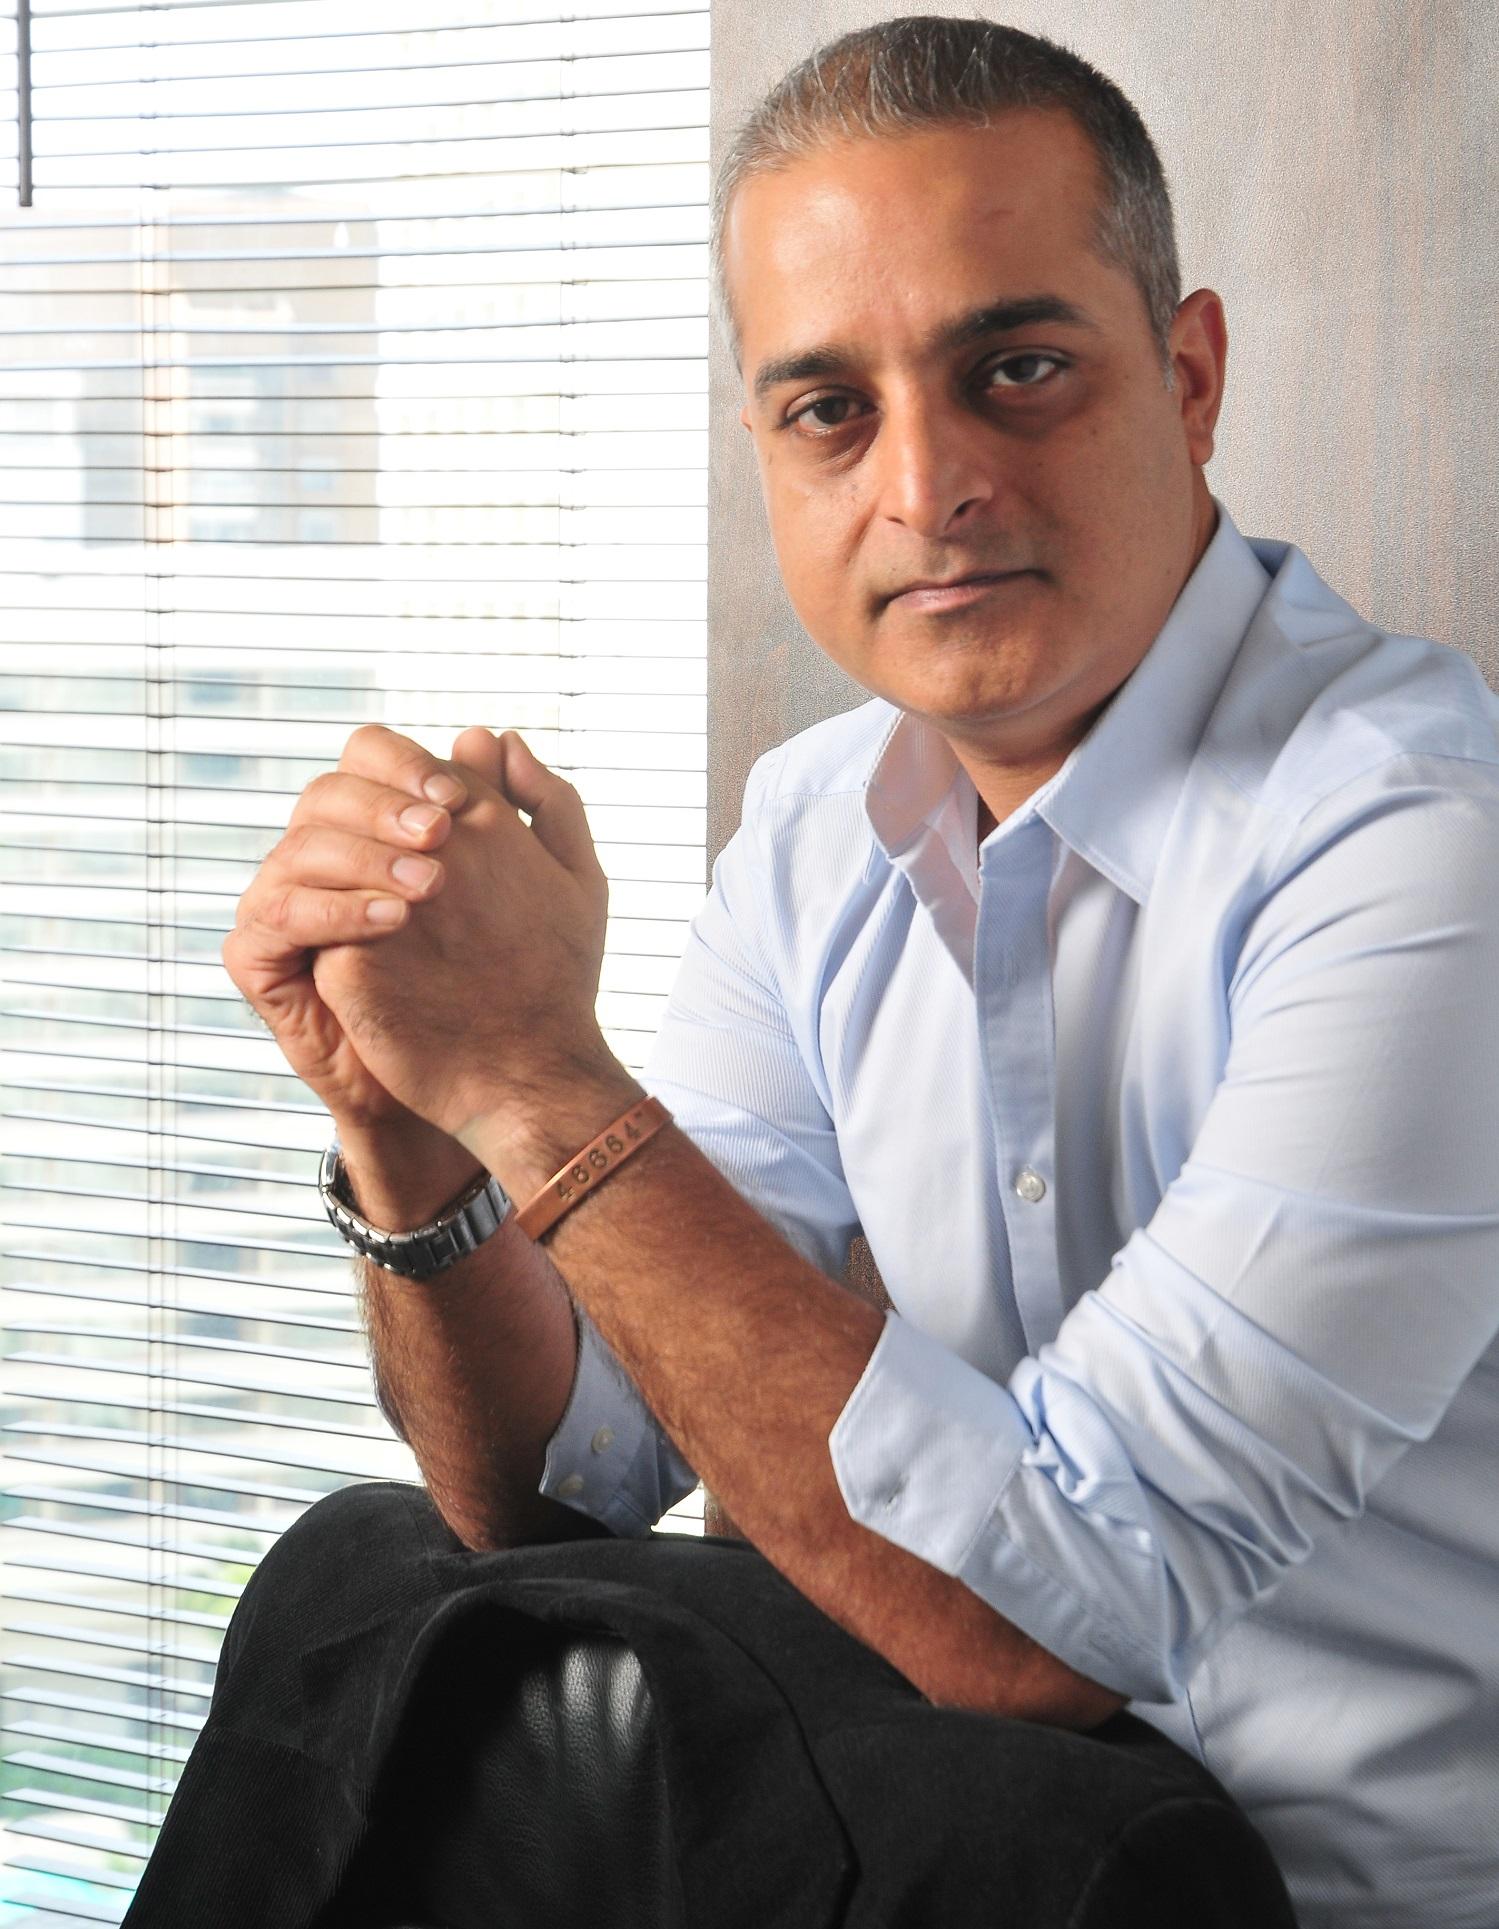 Ogilvy Africa CEO - Ogilvy Africa has named Vikas Mehta as its new CEO www.businesstoday.co.ke